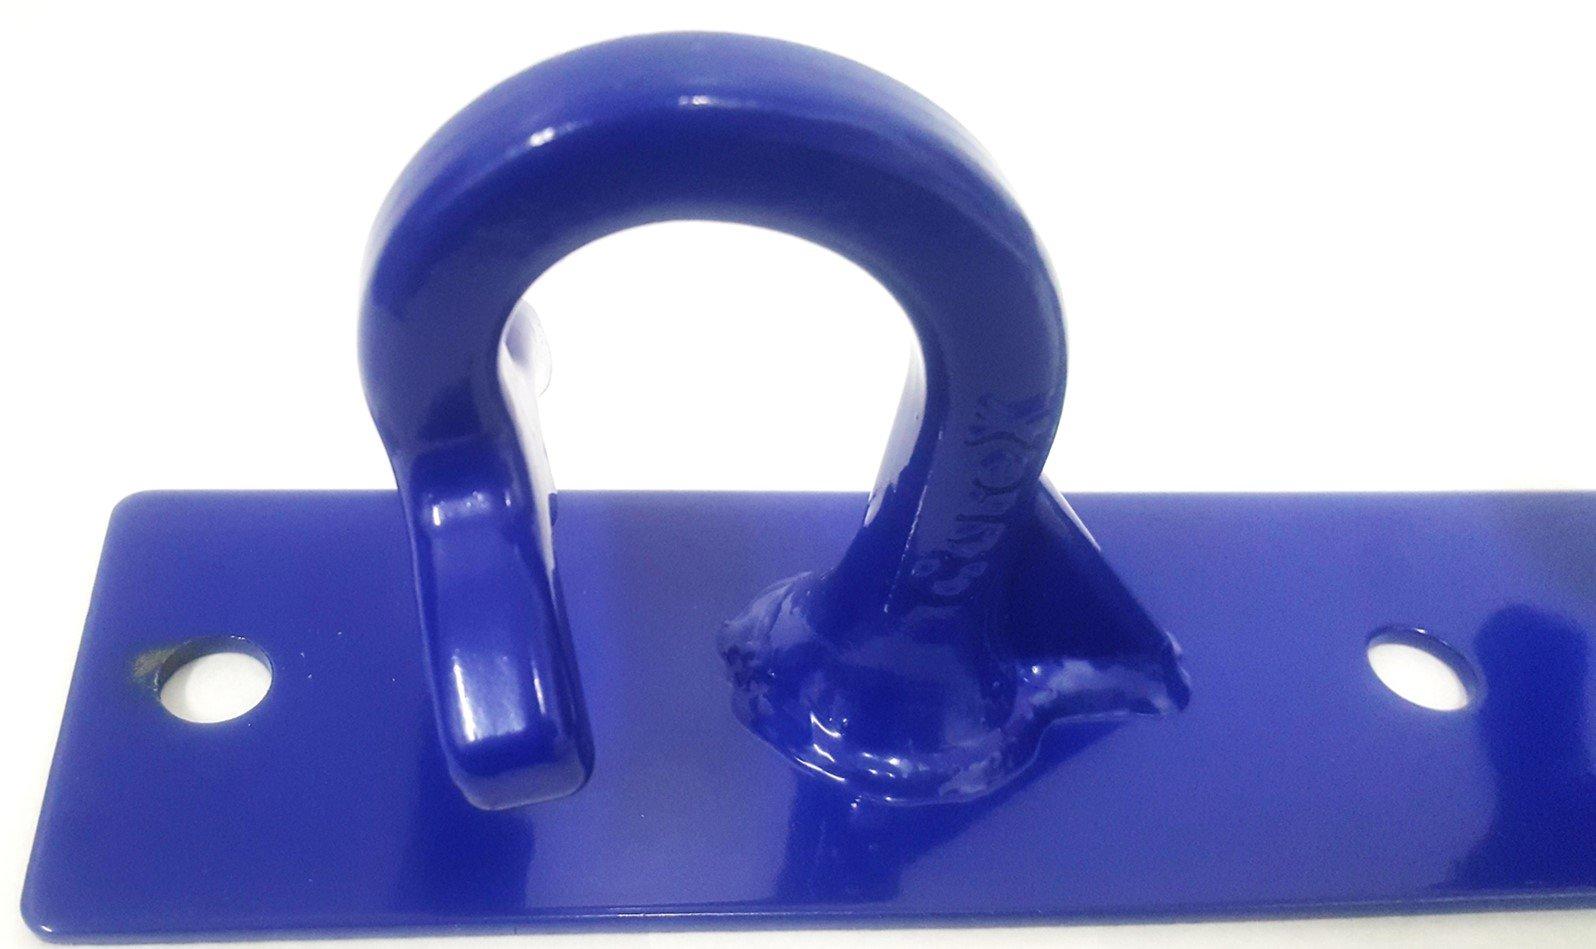 CoreMount Hook, Suspension Bodyweight and Resistance Training Hook Mounts (Blue, Vertical)